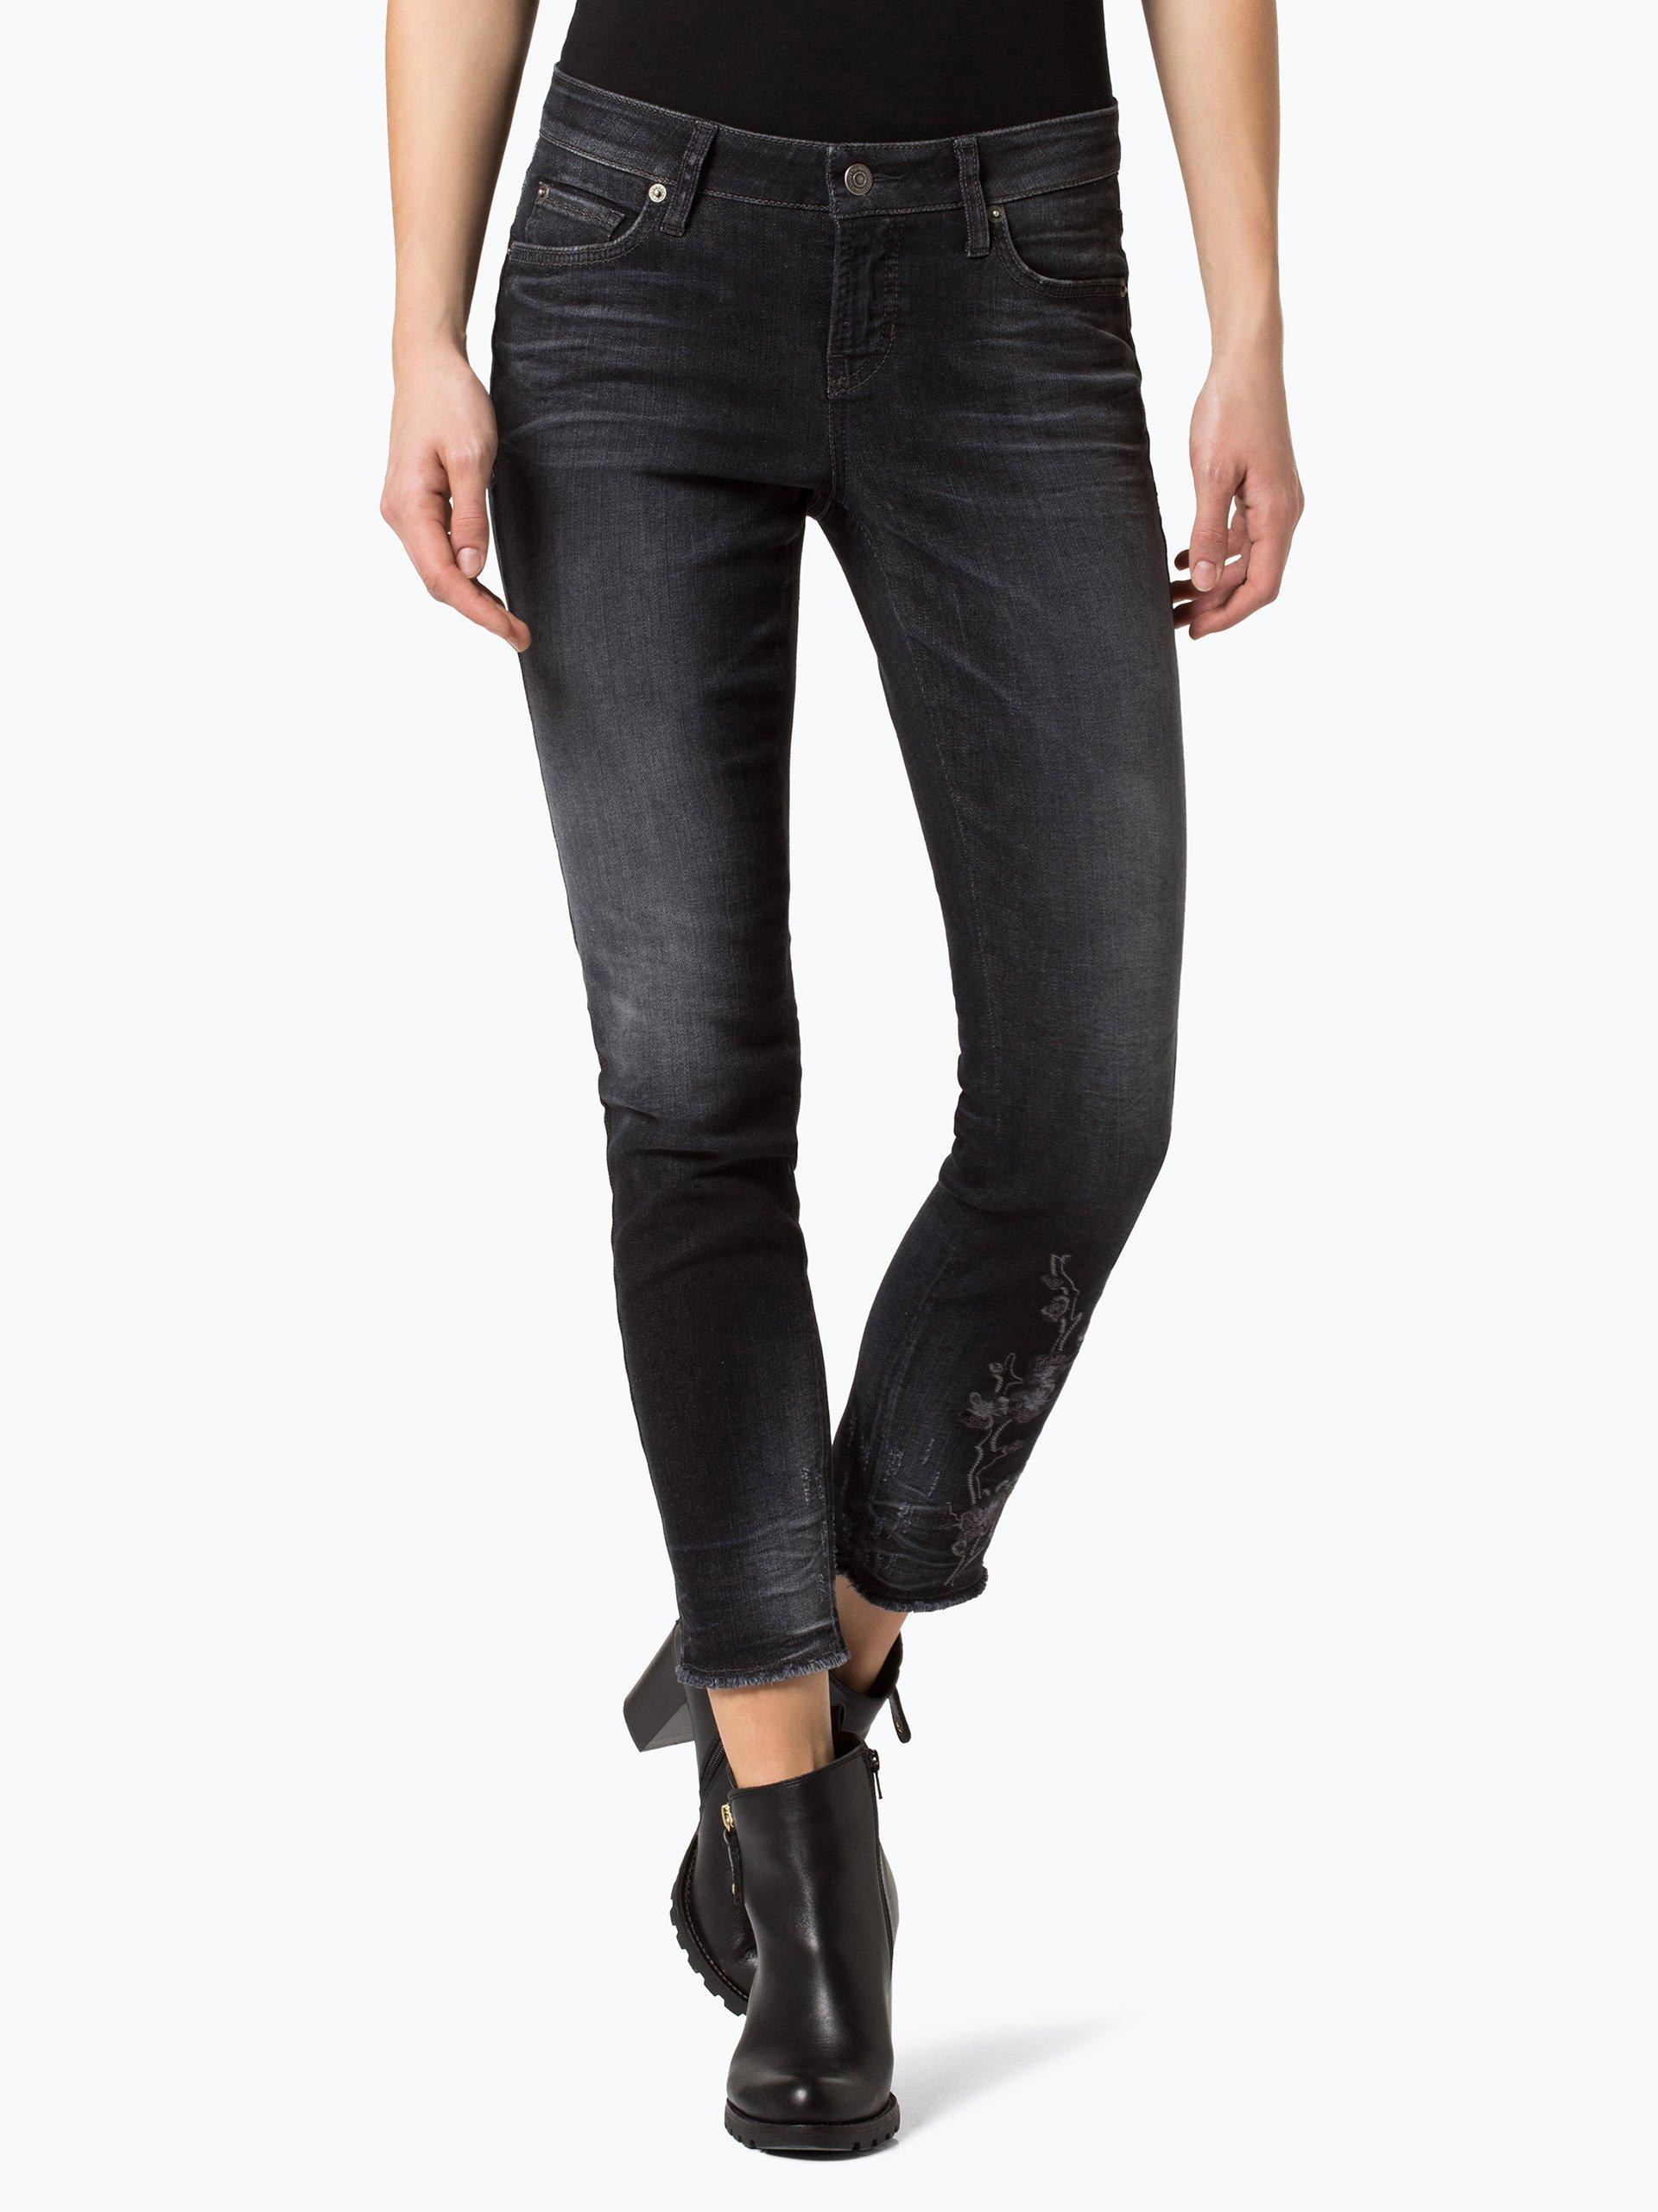 cambio damen jeans liu schwarz anthrazit gemustert online kaufen vangraaf com. Black Bedroom Furniture Sets. Home Design Ideas